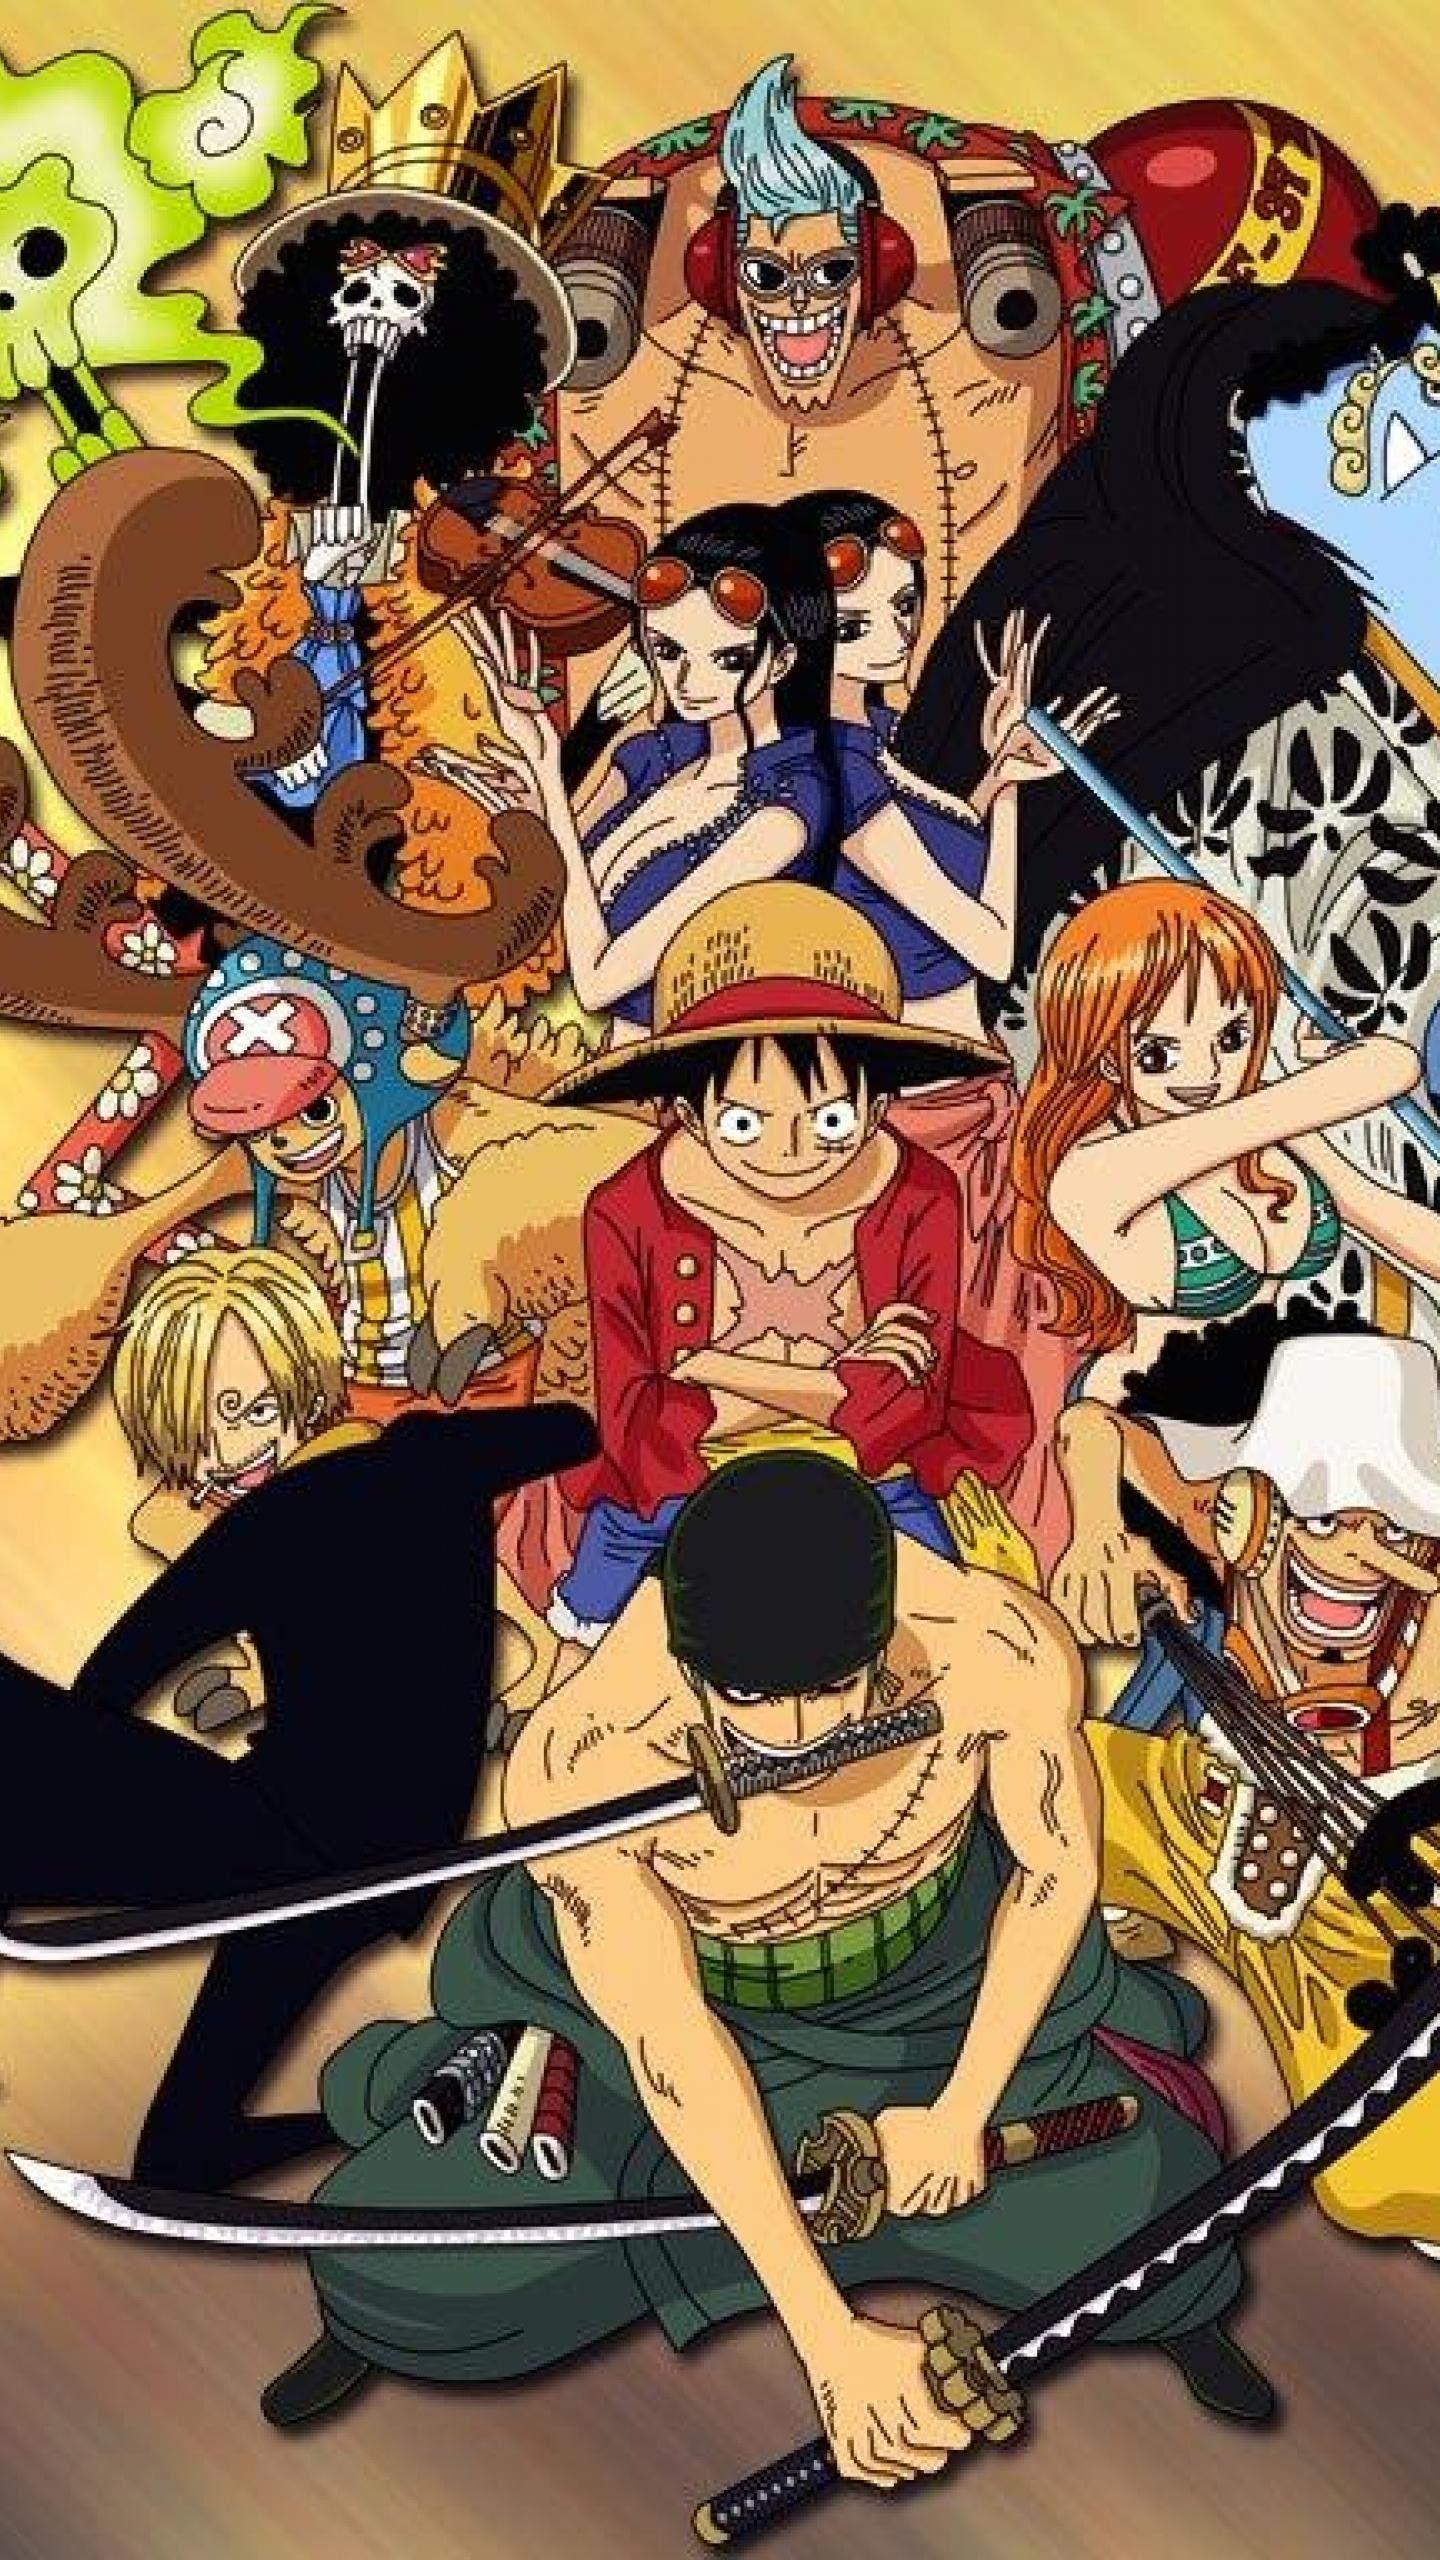 Wallpaper One Piece Luffy Lucu Ia Dikenal Sebagai Karakter Lucu Kocak Bodoh Namun Juga Keren Dan Kuat Gambar Wallpa In 2020 One Piece Luffy Luffy Hd Anime Wallpapers